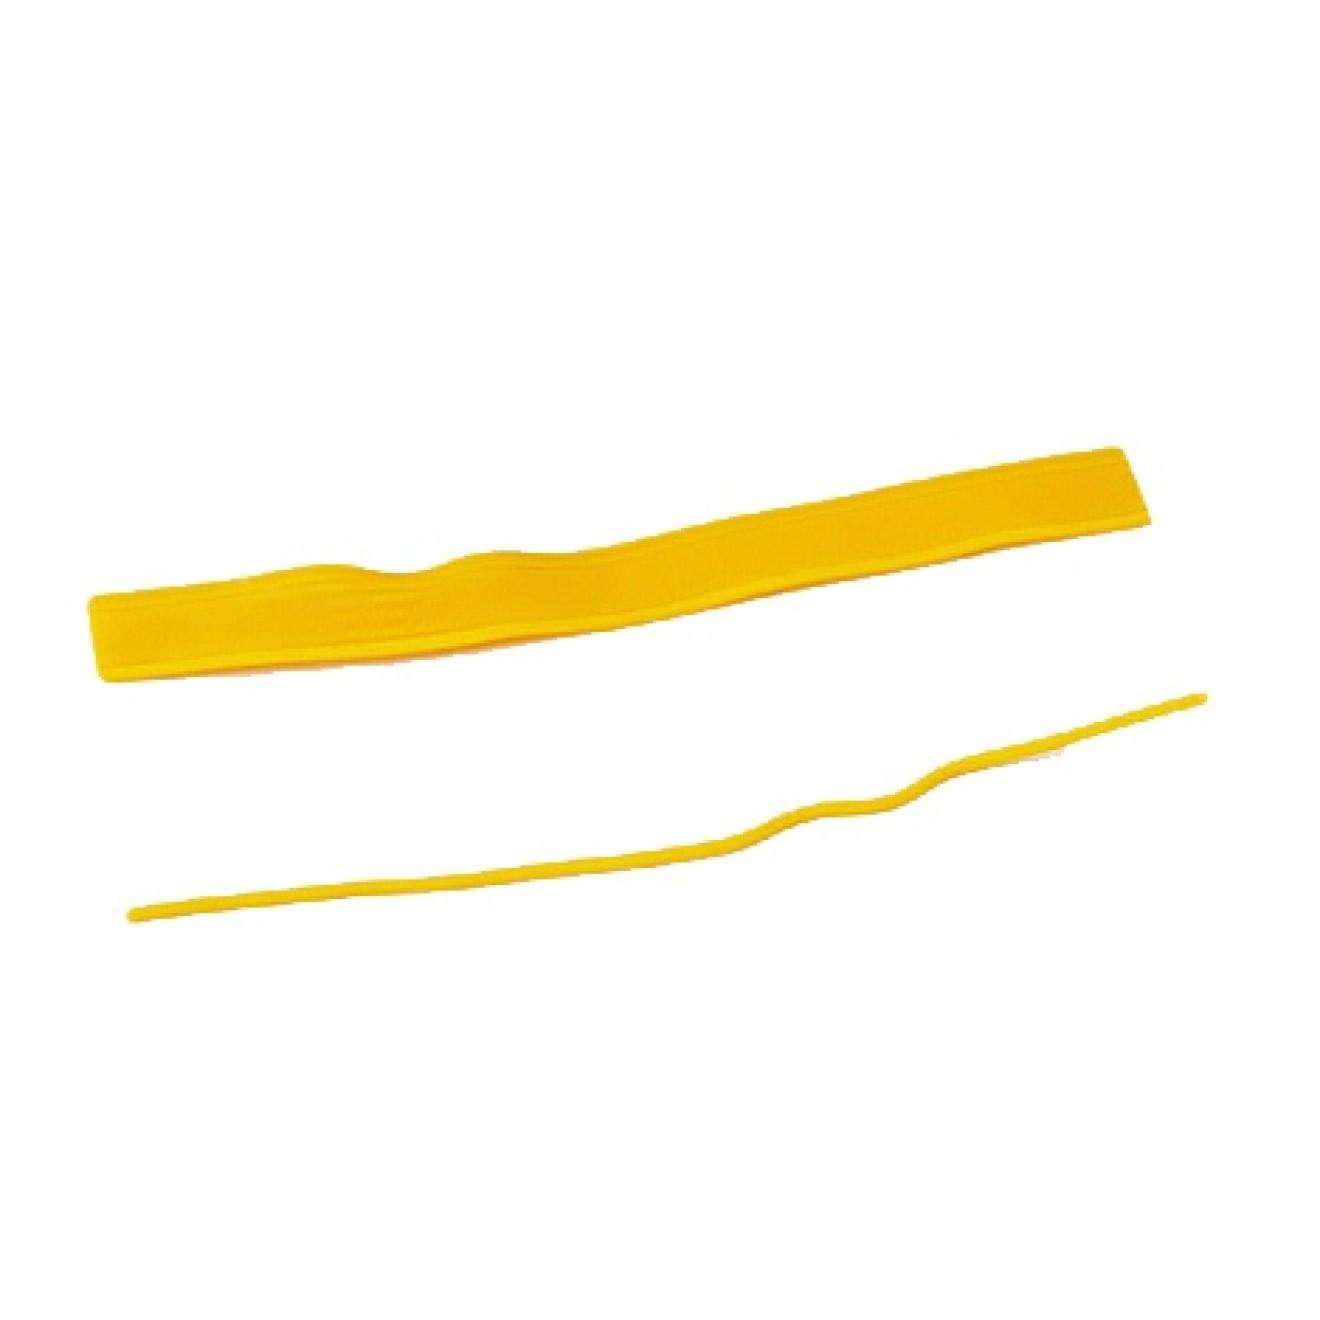 Spro C-Tec Bite Indicator Hanger 23cm Blue Red Green Yellow Purple Bissanzeiger